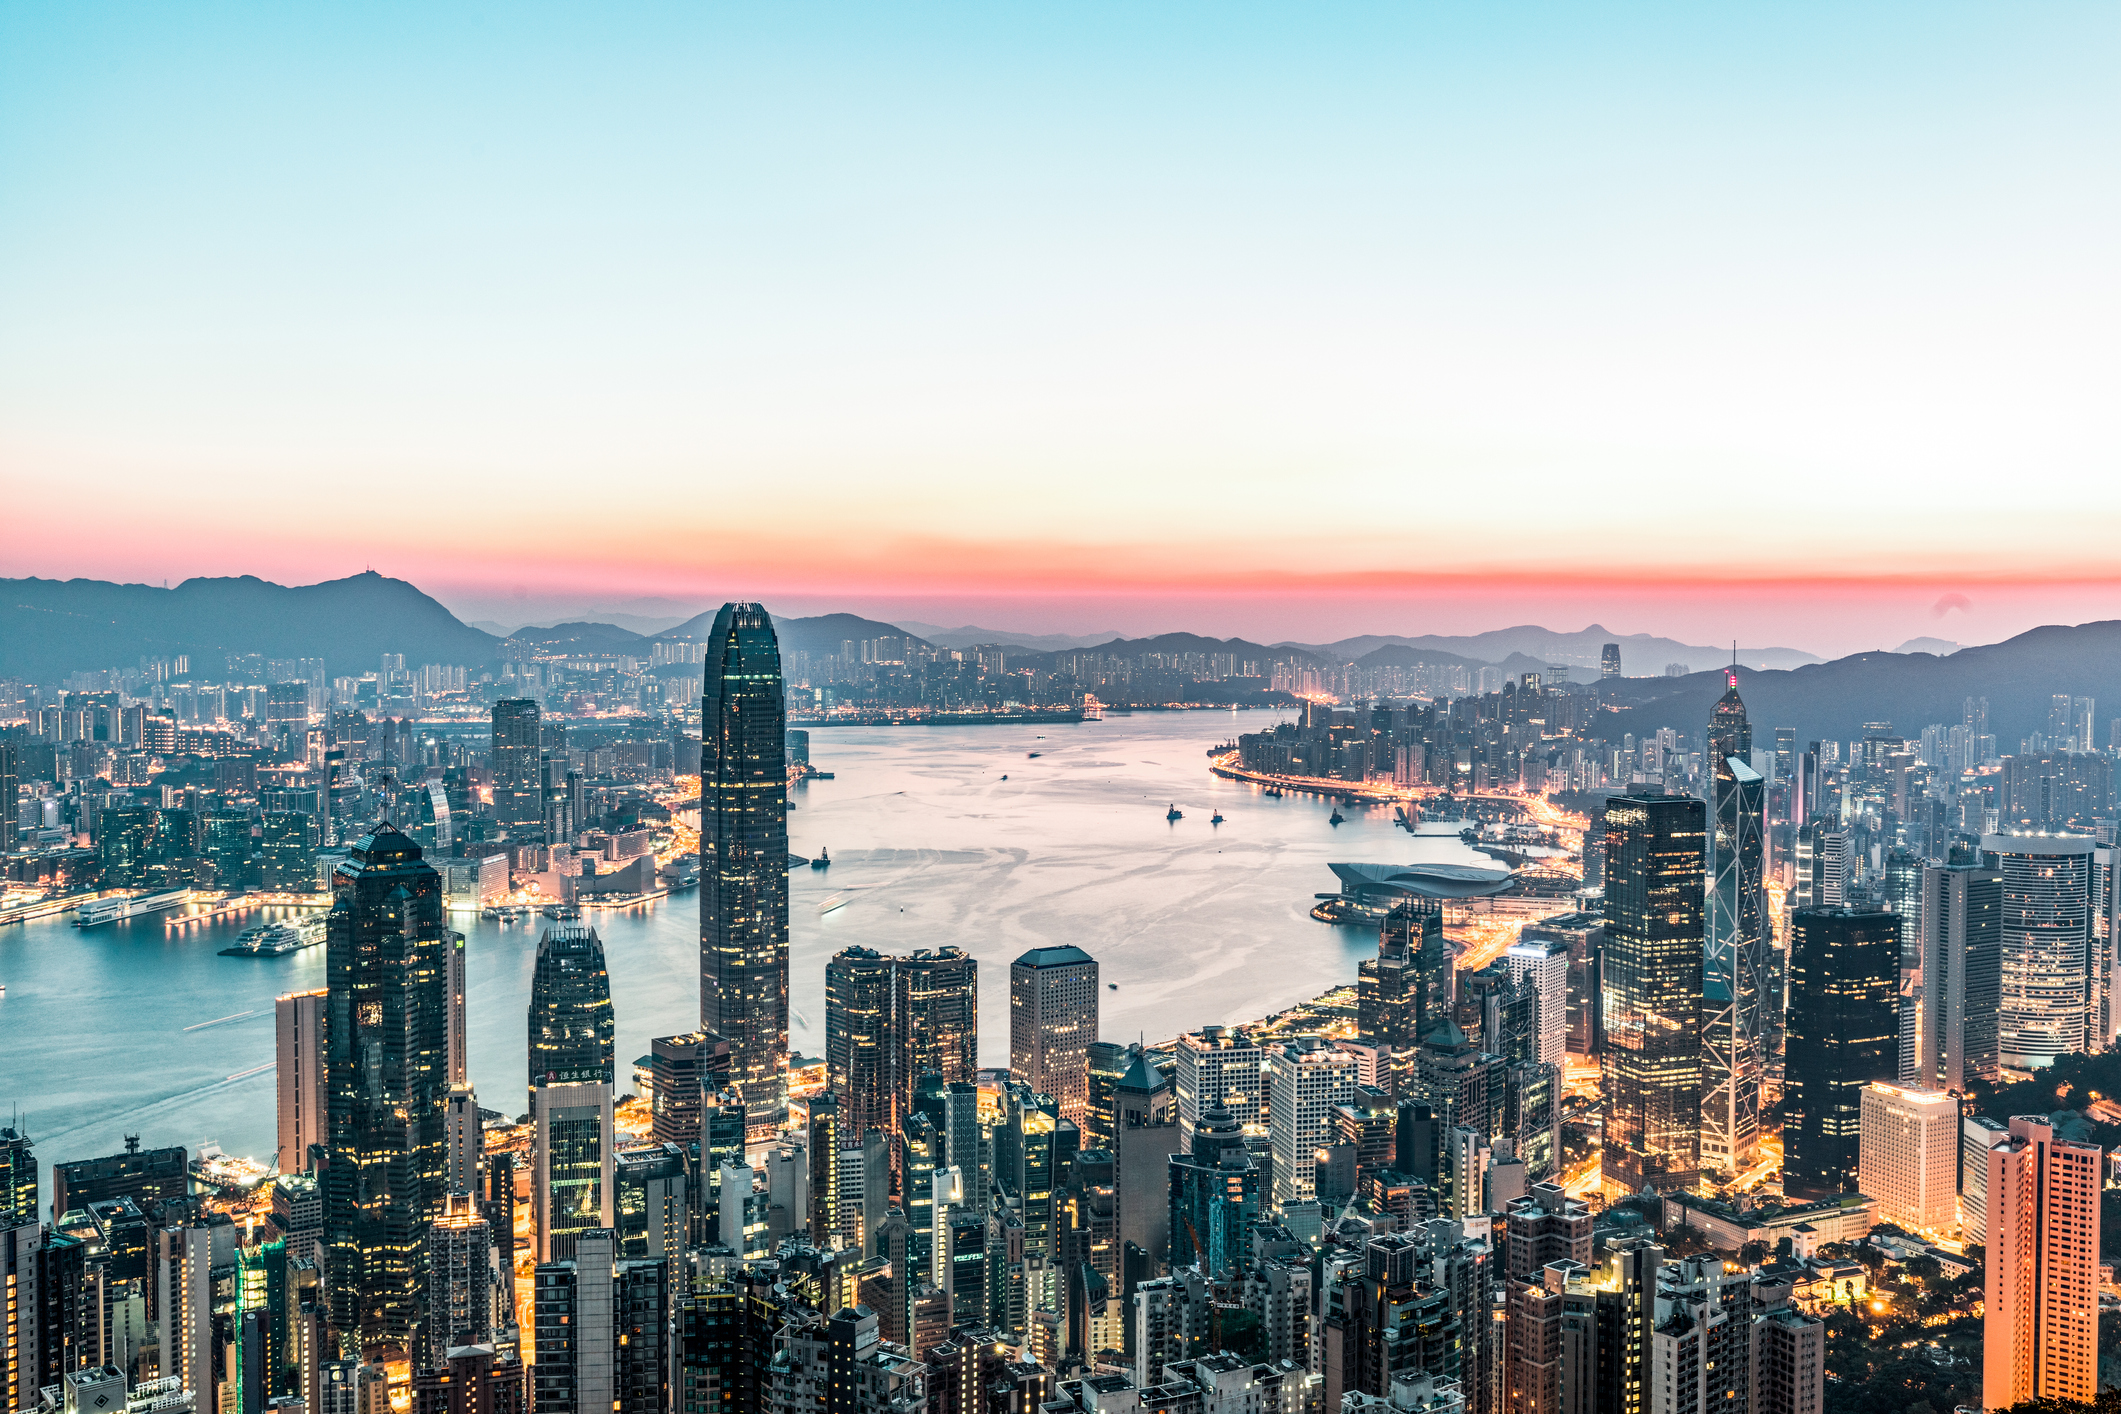 hong kong (piano economico contro crisi e coronavirus)